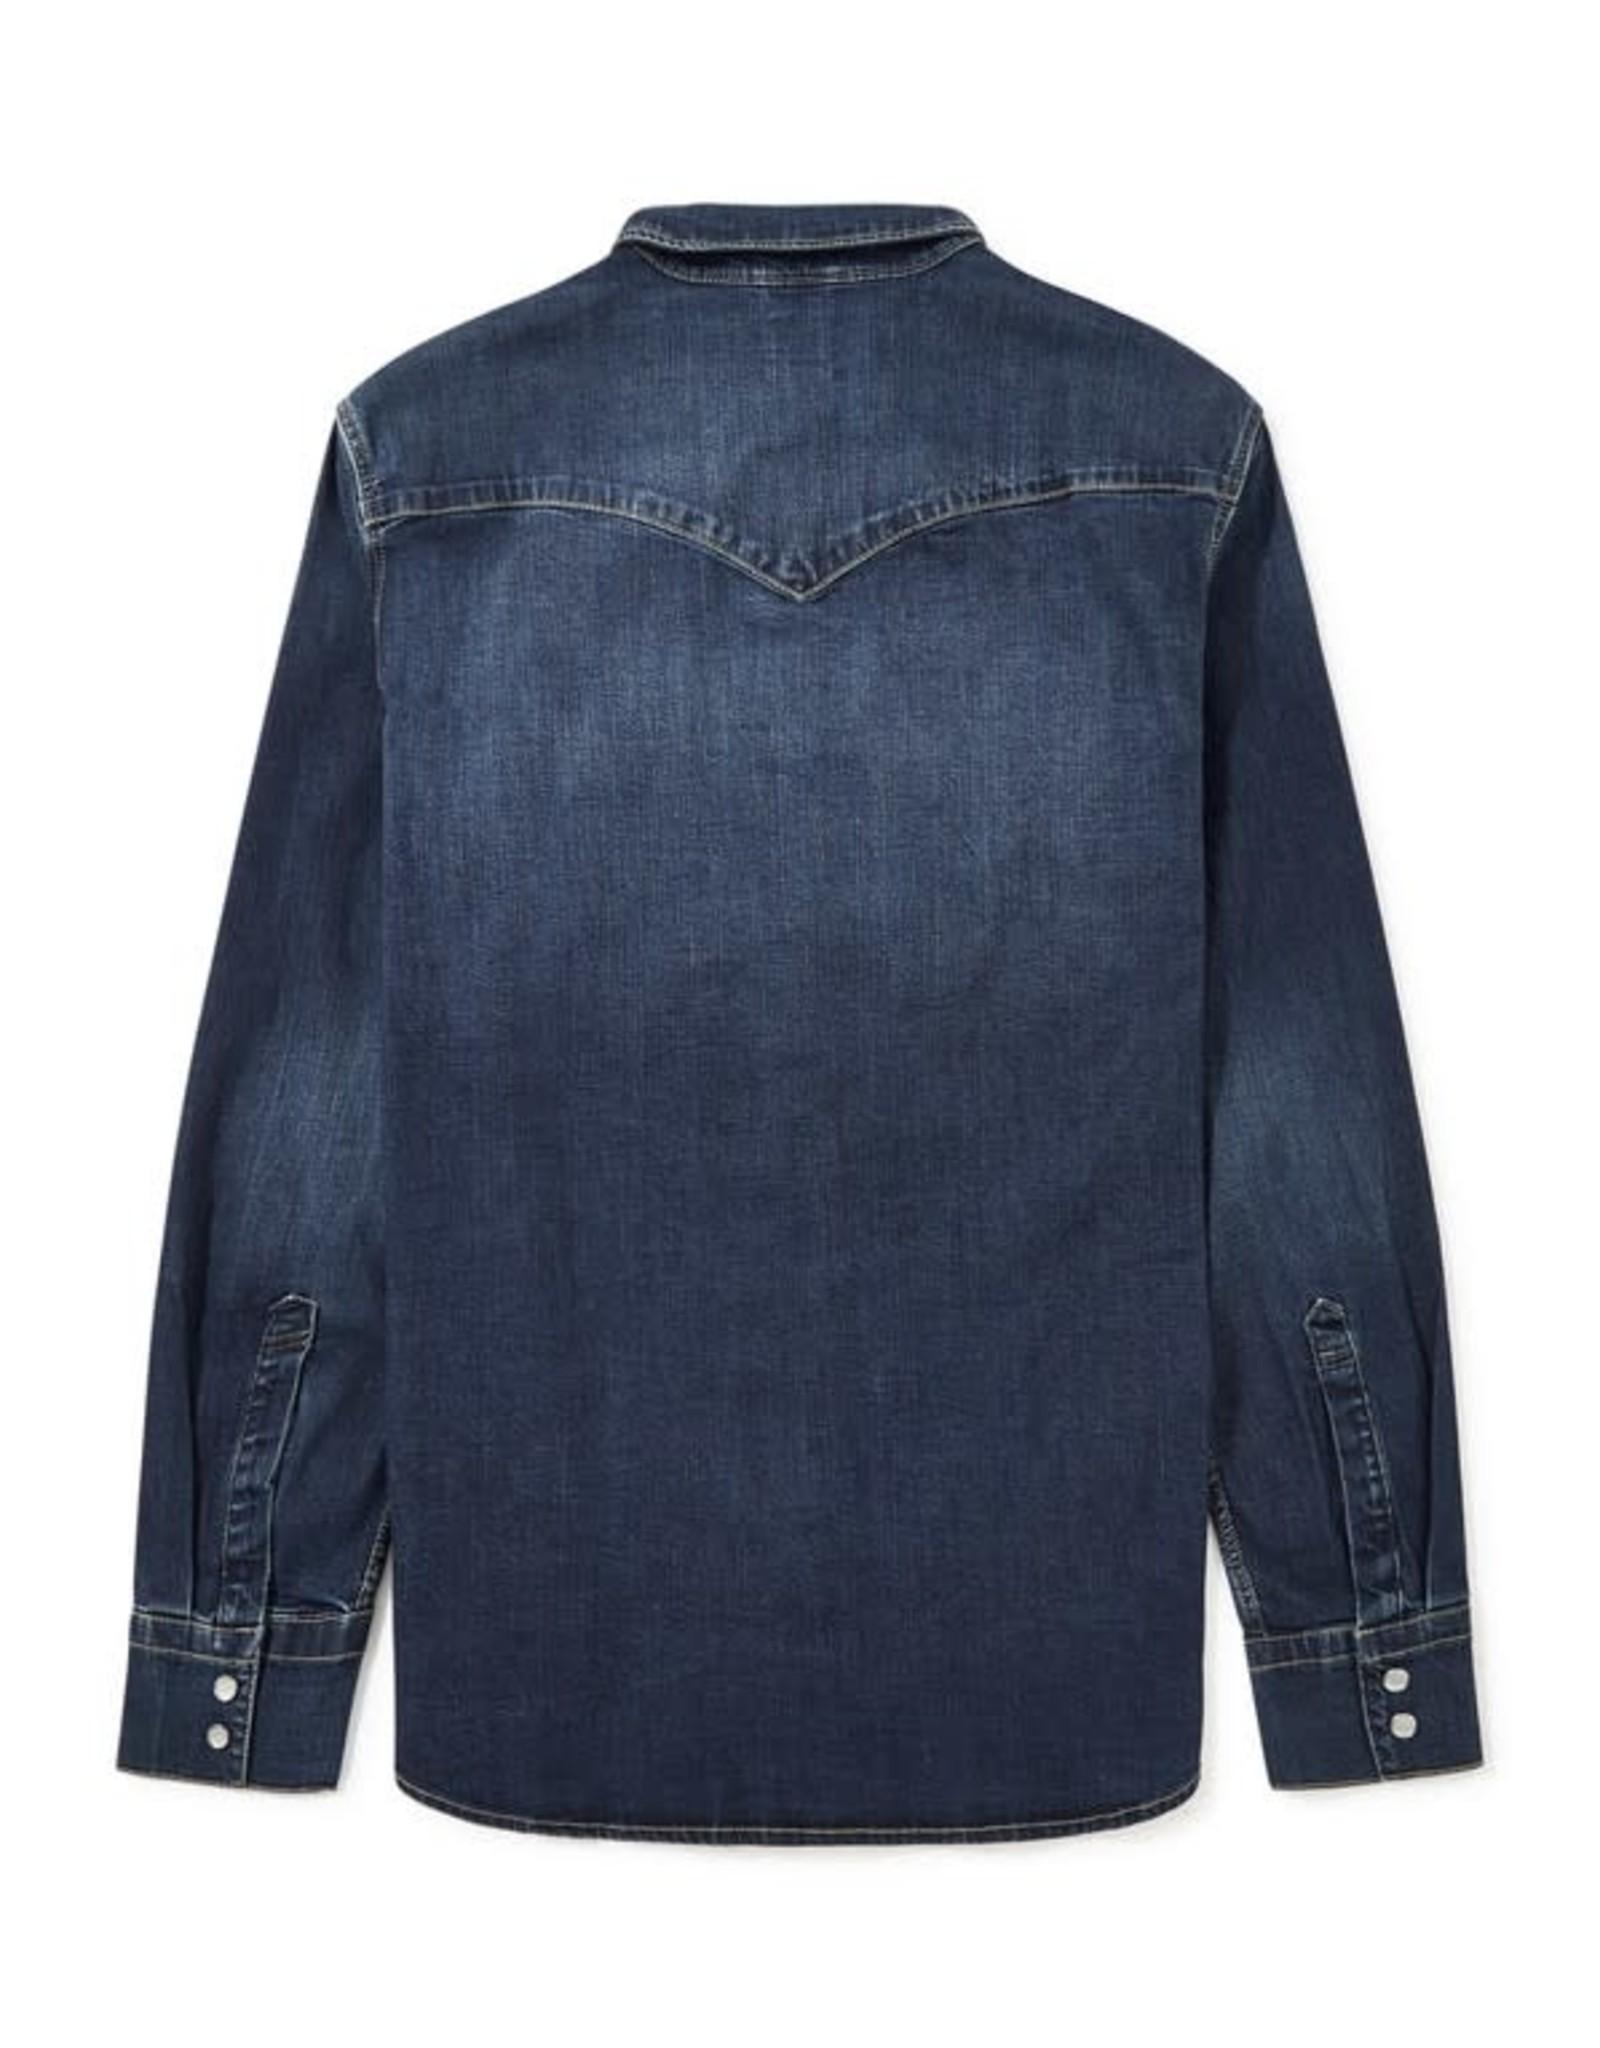 Levi's Barstow Western Standard Shirt